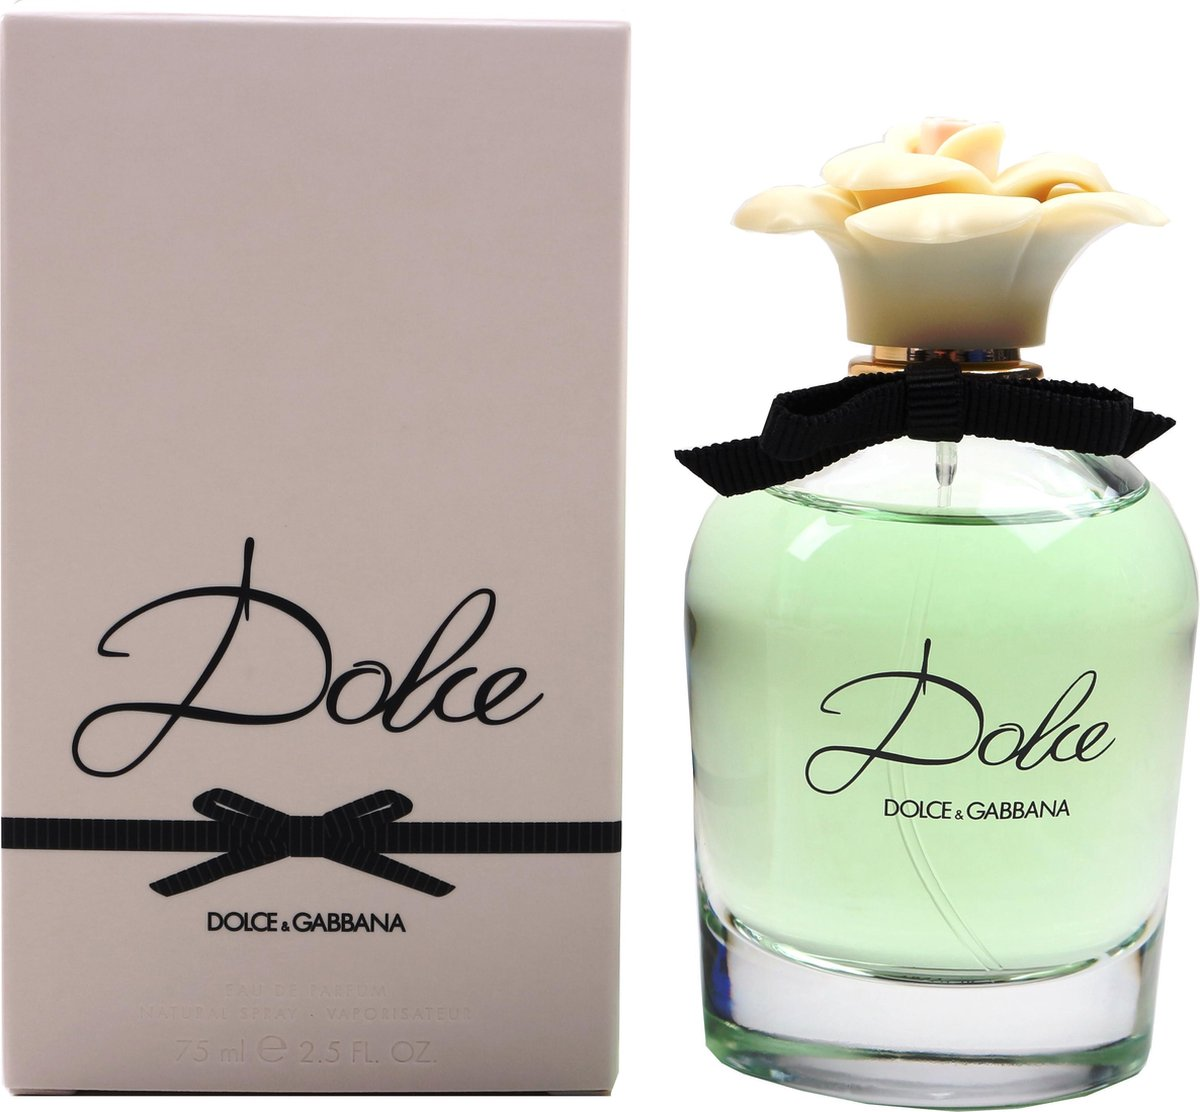   Dolce & Gabbana Dolce & Gabbana Eau de parfum